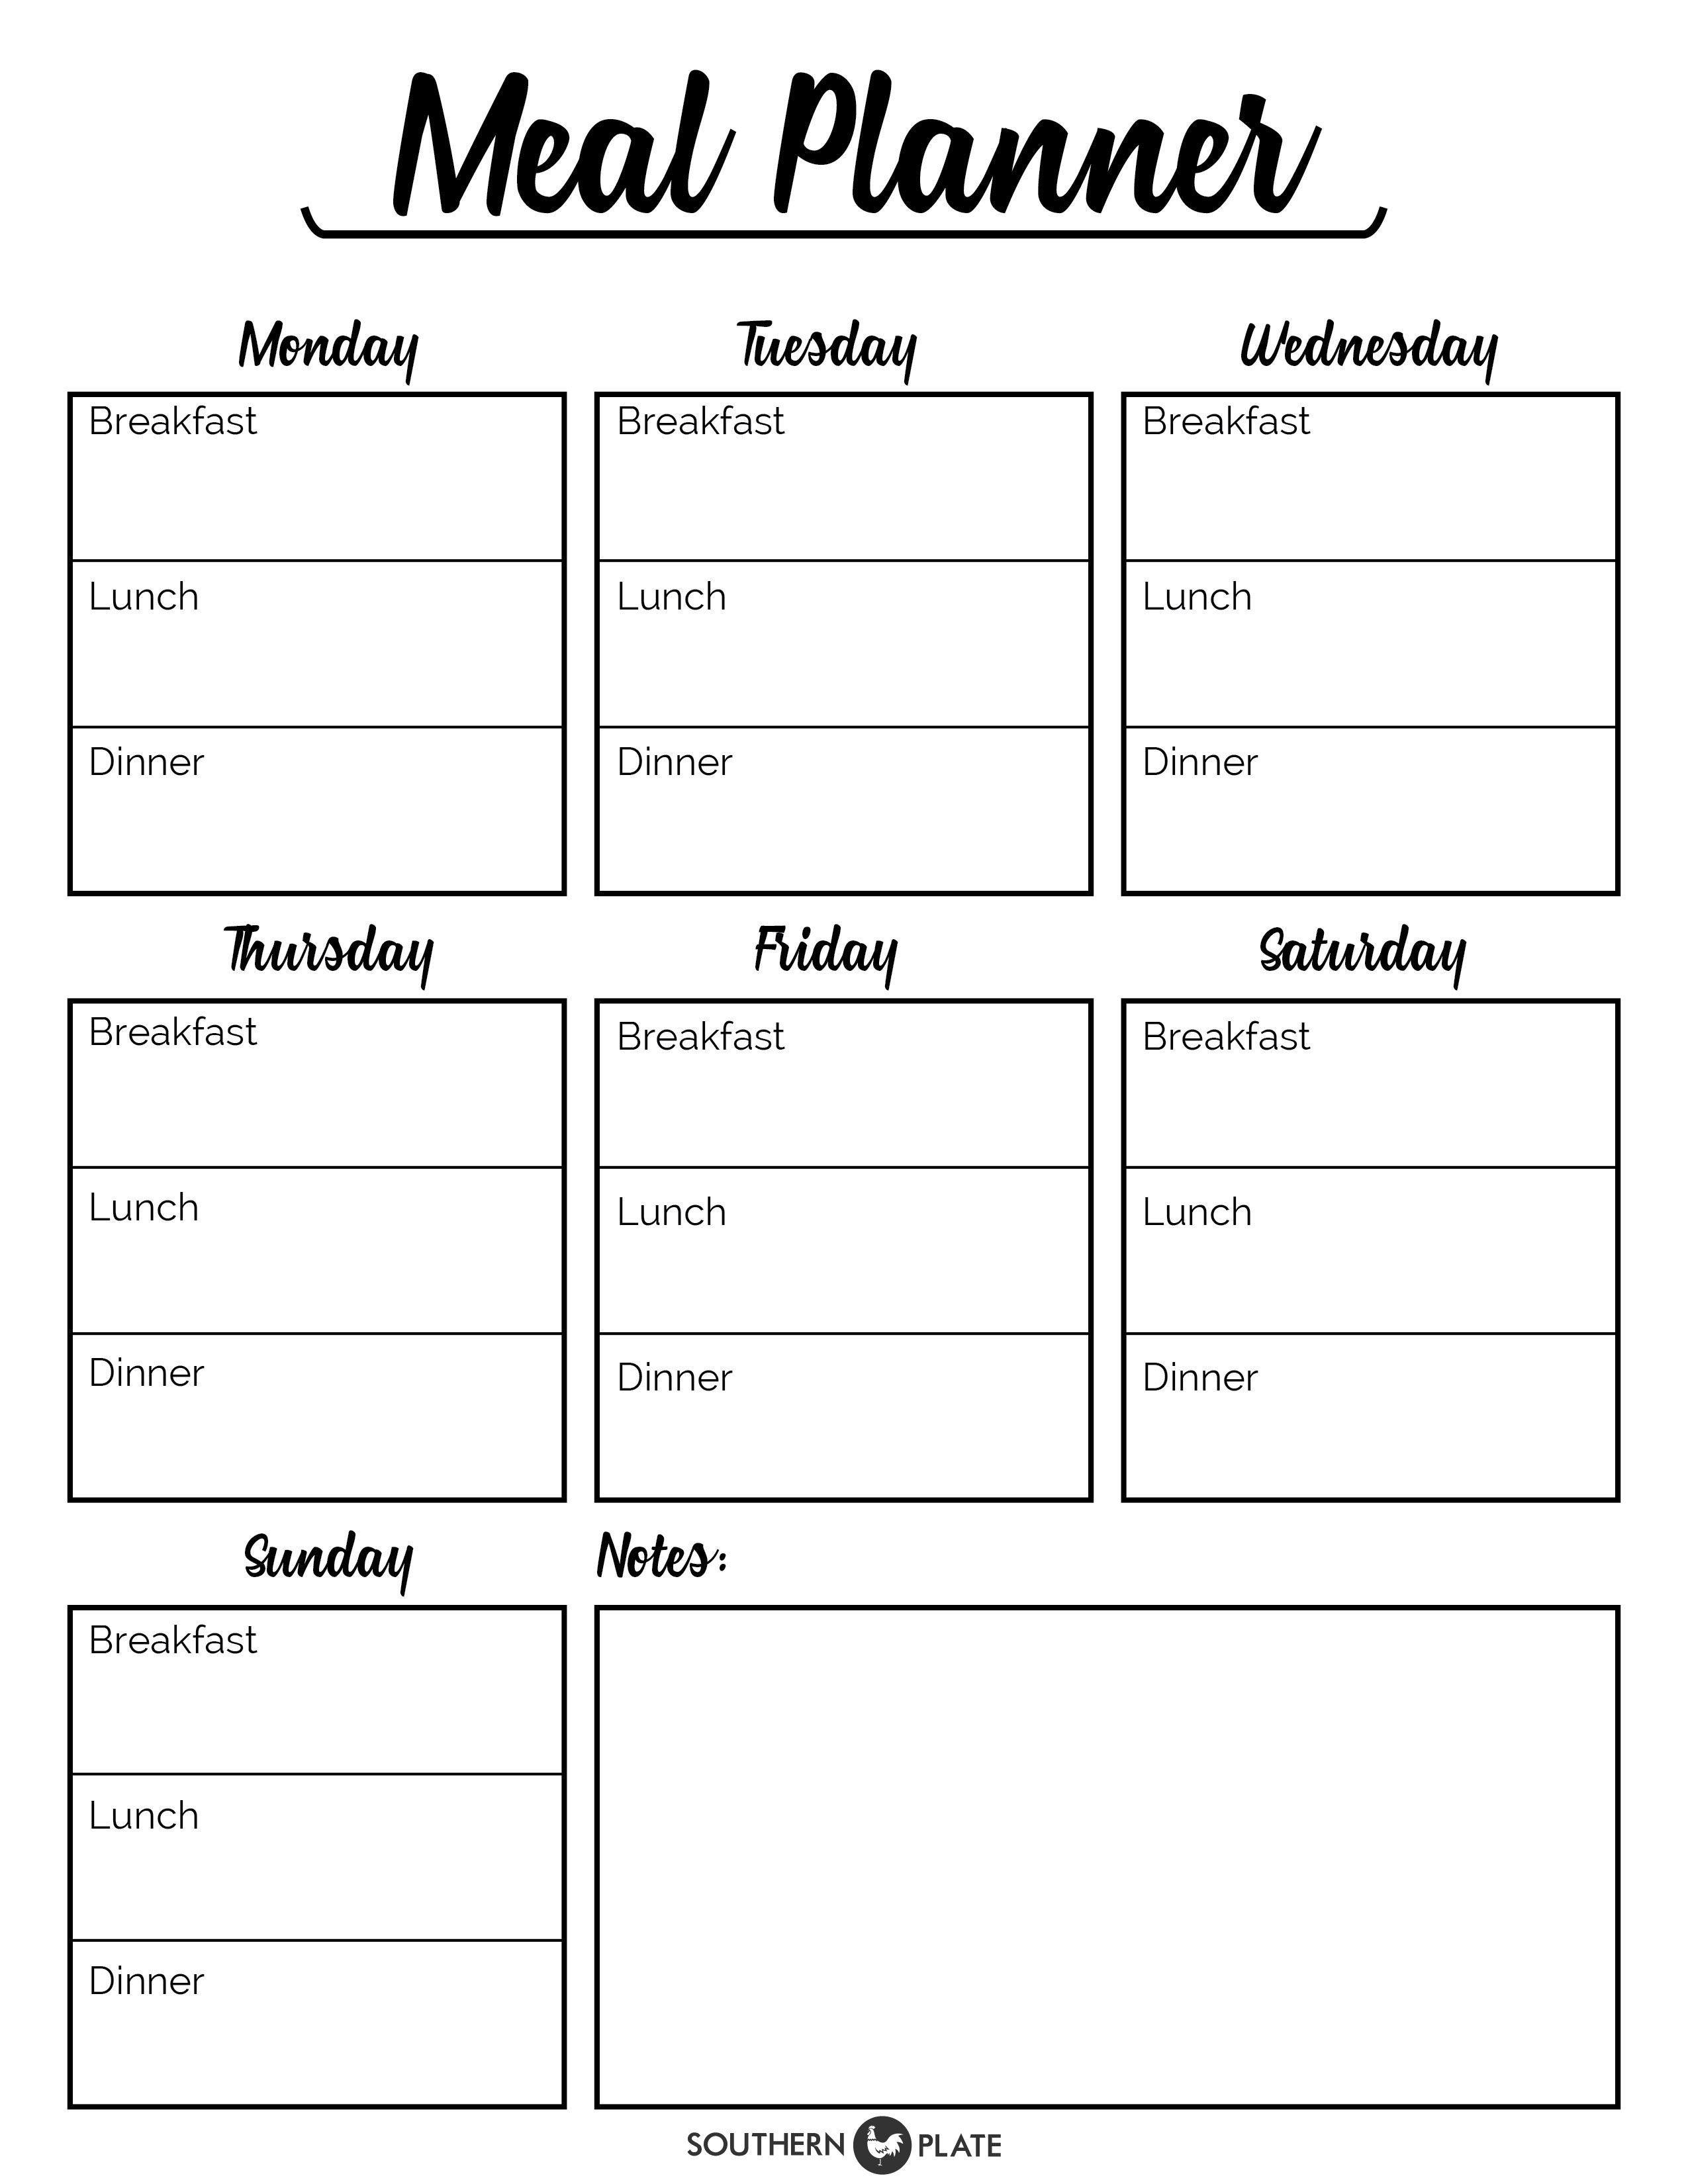 001 Incredible Meal Plan Printable Pdf Concept  Worksheet Downloadable Template SheetFull